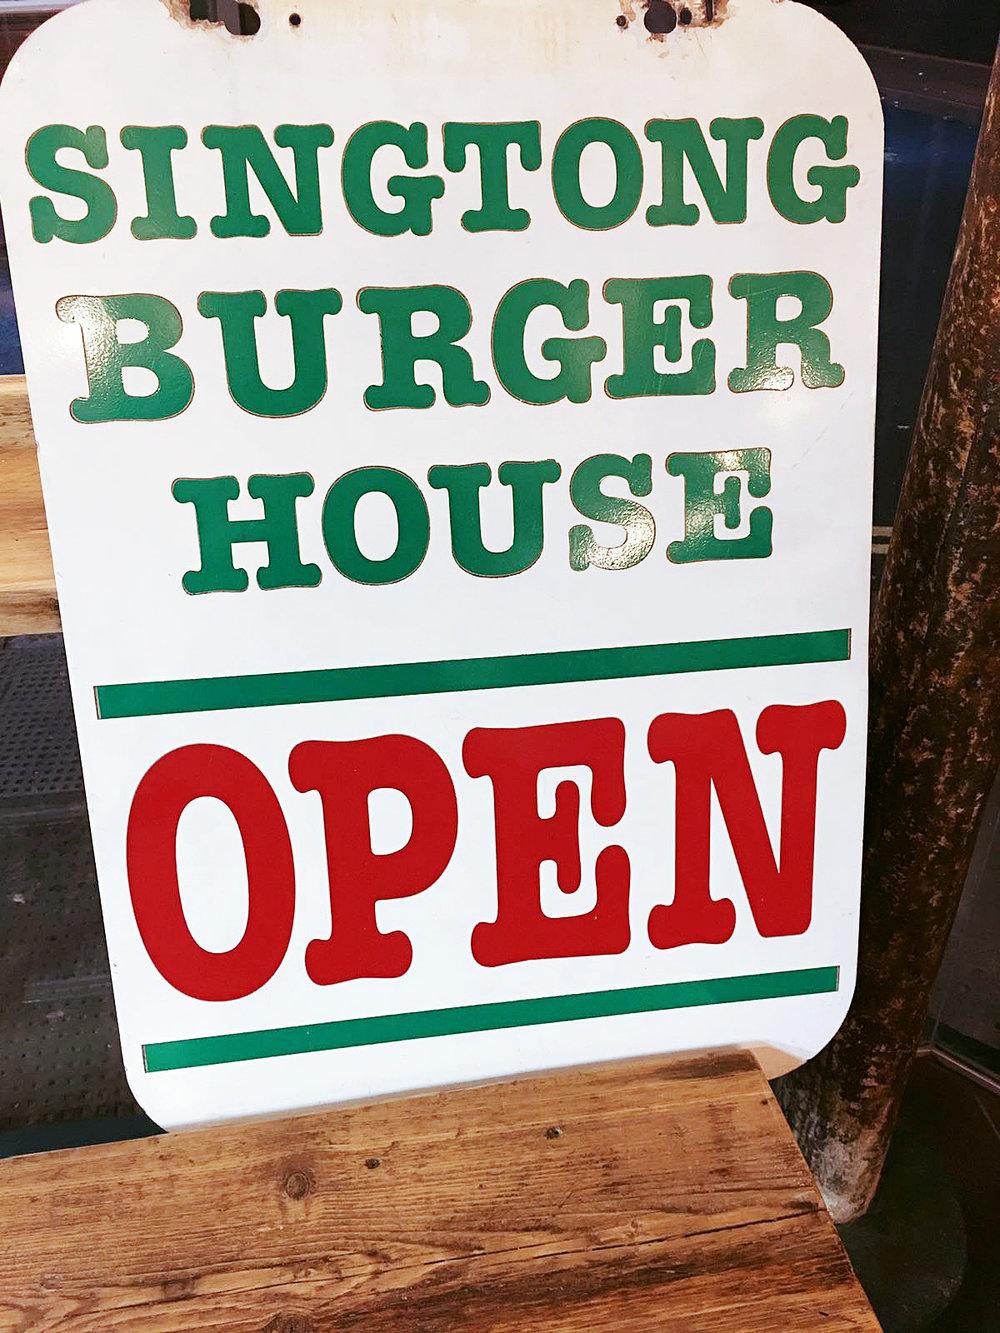 Singtong burger house is Open!